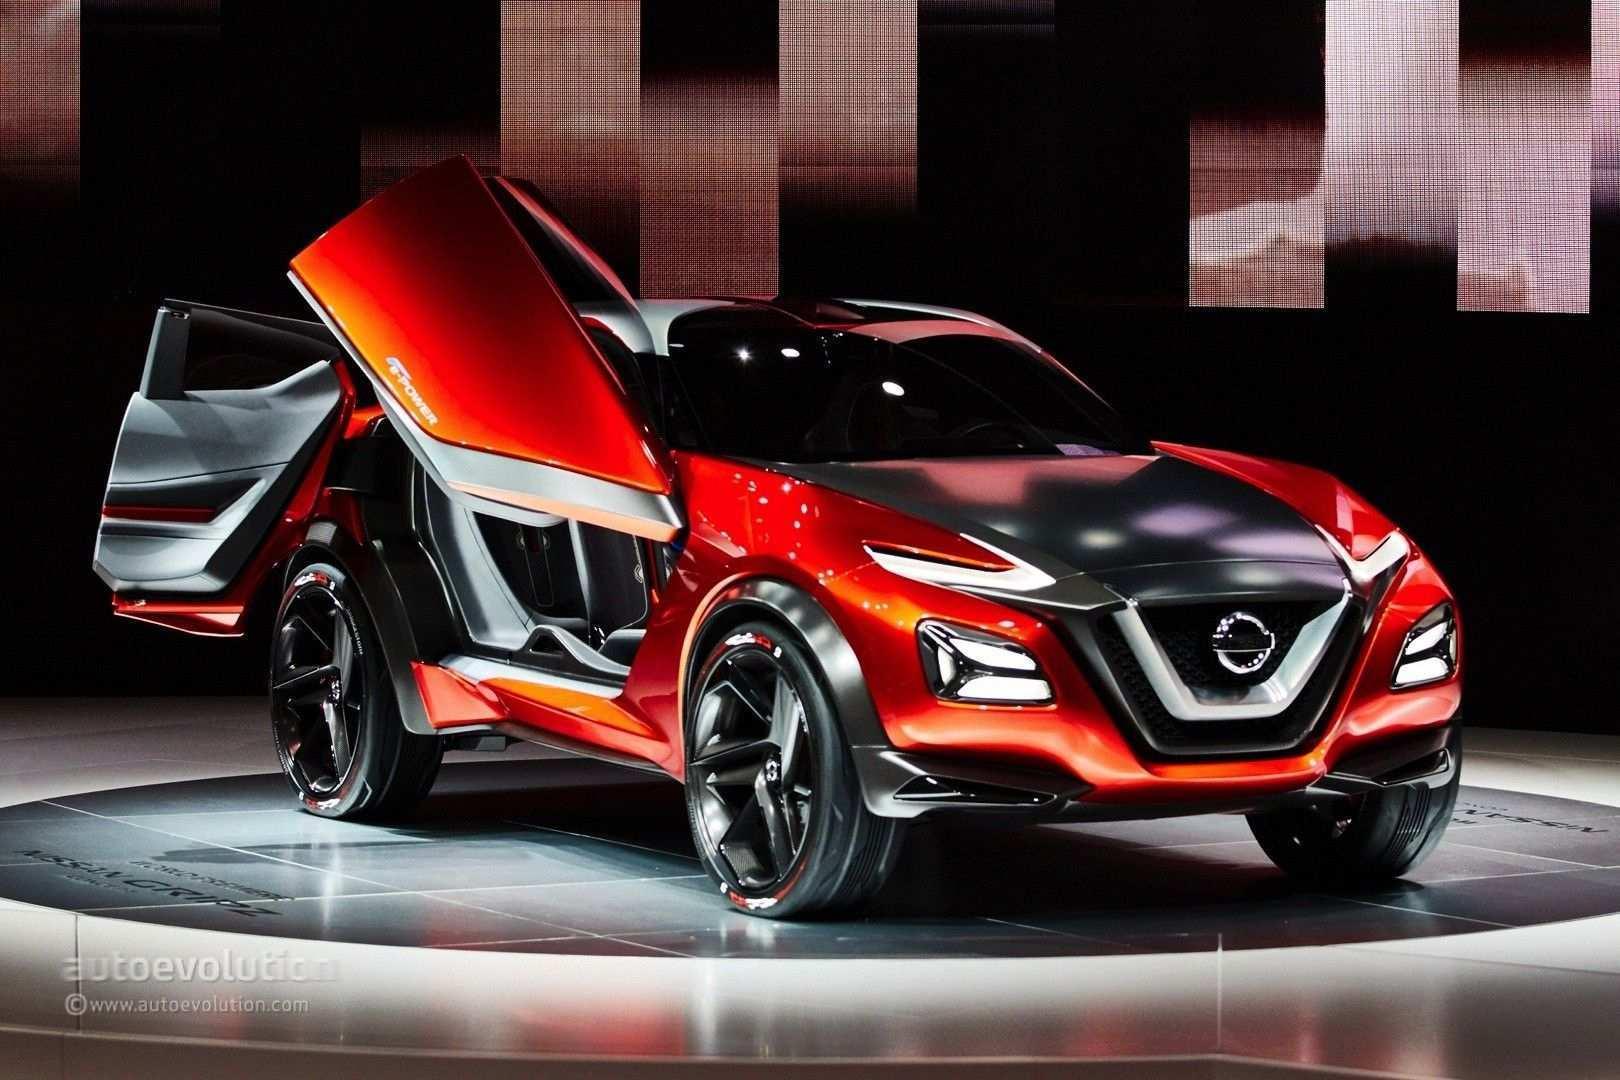 31 All New Nissan Juke 2020 Exterior Date Speed Test by Nissan Juke 2020 Exterior Date